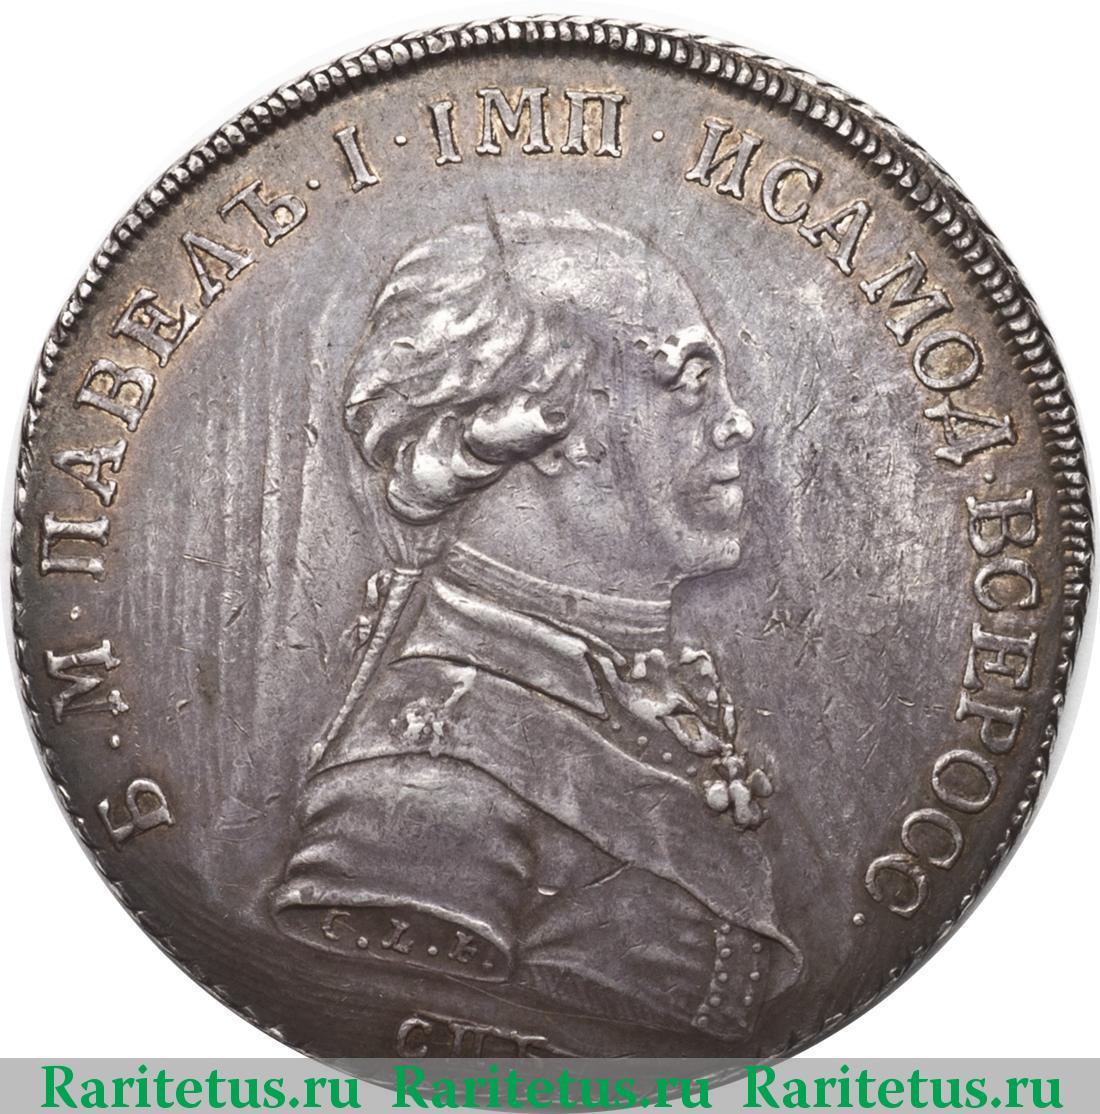 Рубль 1796 года цена павел 1 пробный рубль 1766 года